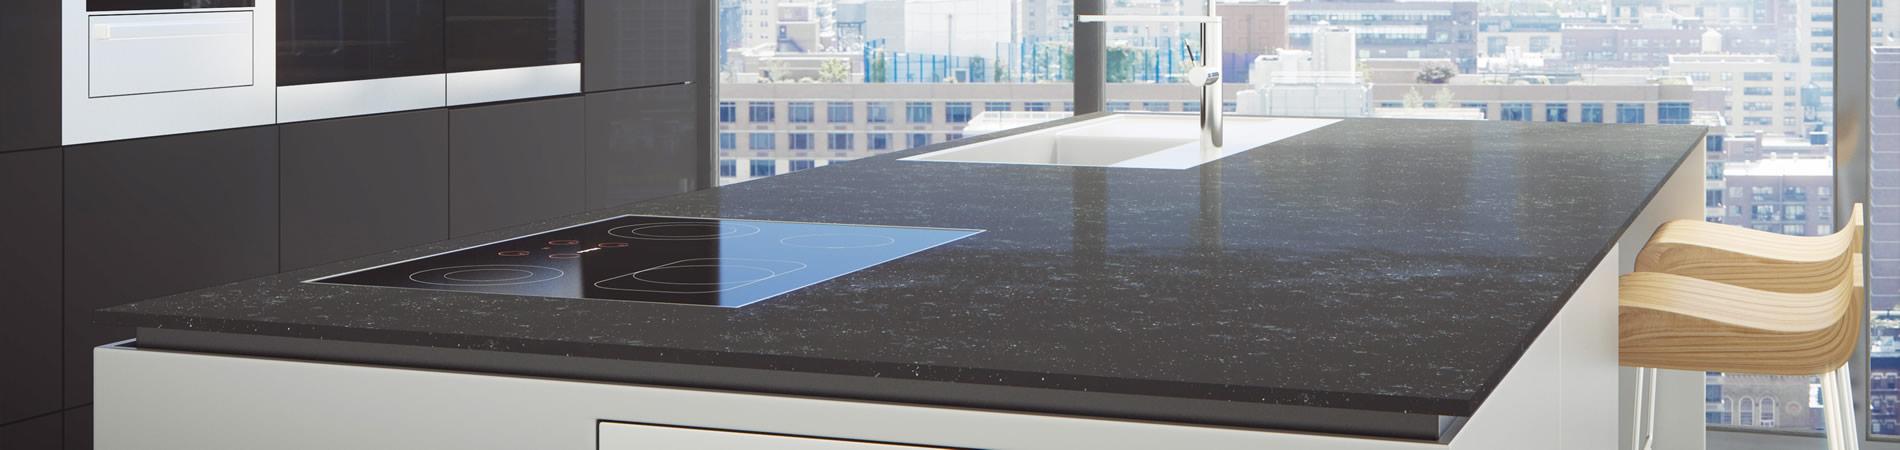 4044 Airy Concrete Worktops- Sensational 4044 Airy Concrete